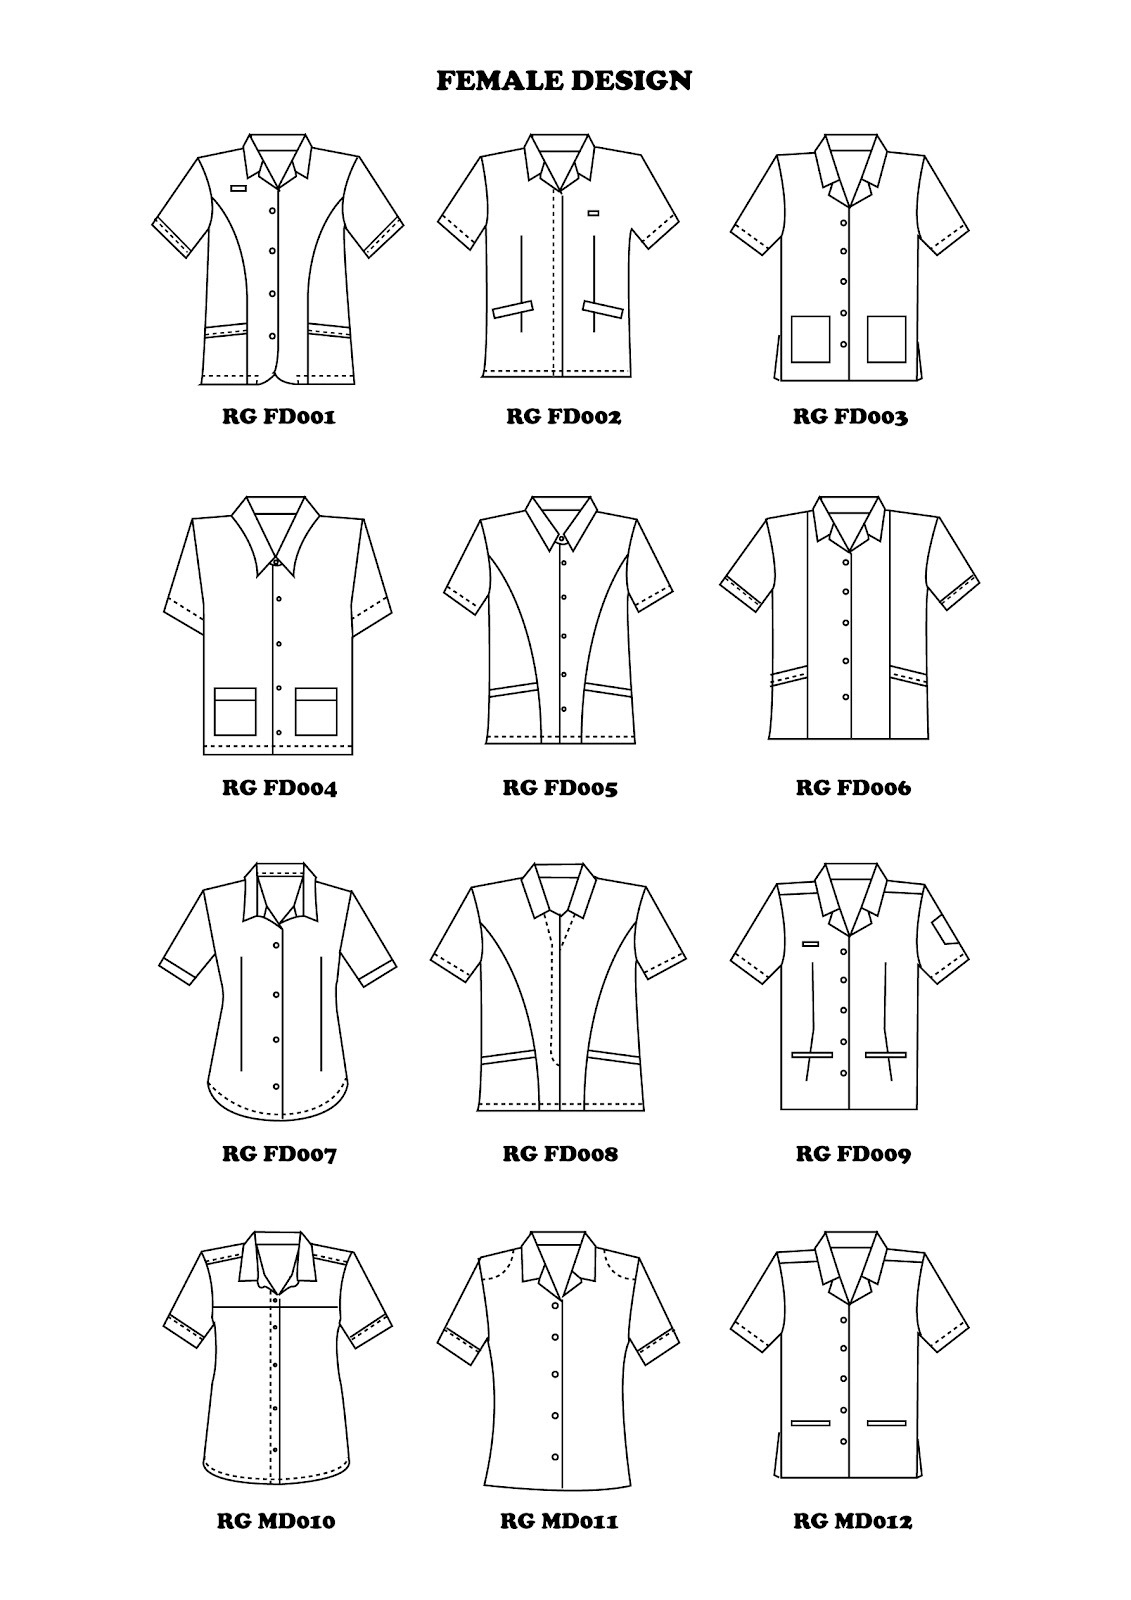 Rgsport Sdn Bhd Long Maroon Parka Sj0013 Uniform Design